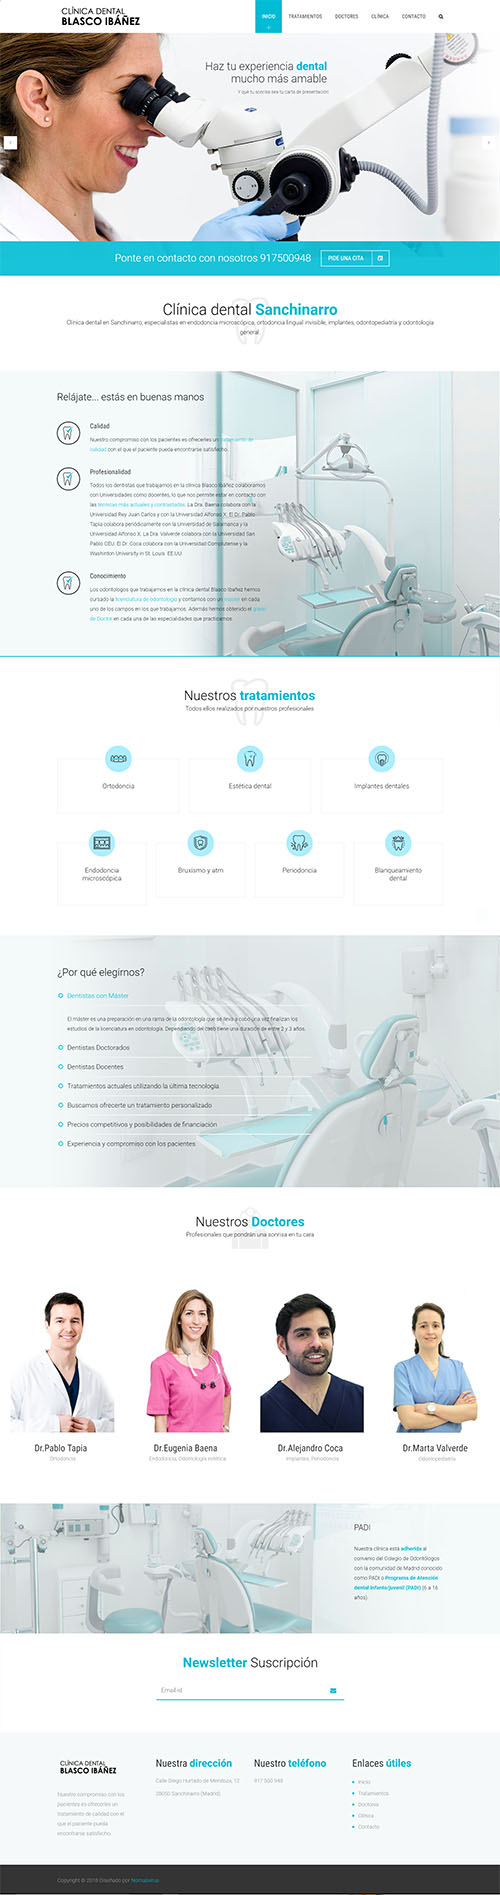 ClinicaBlascoIbanez - Diseño web corporativo